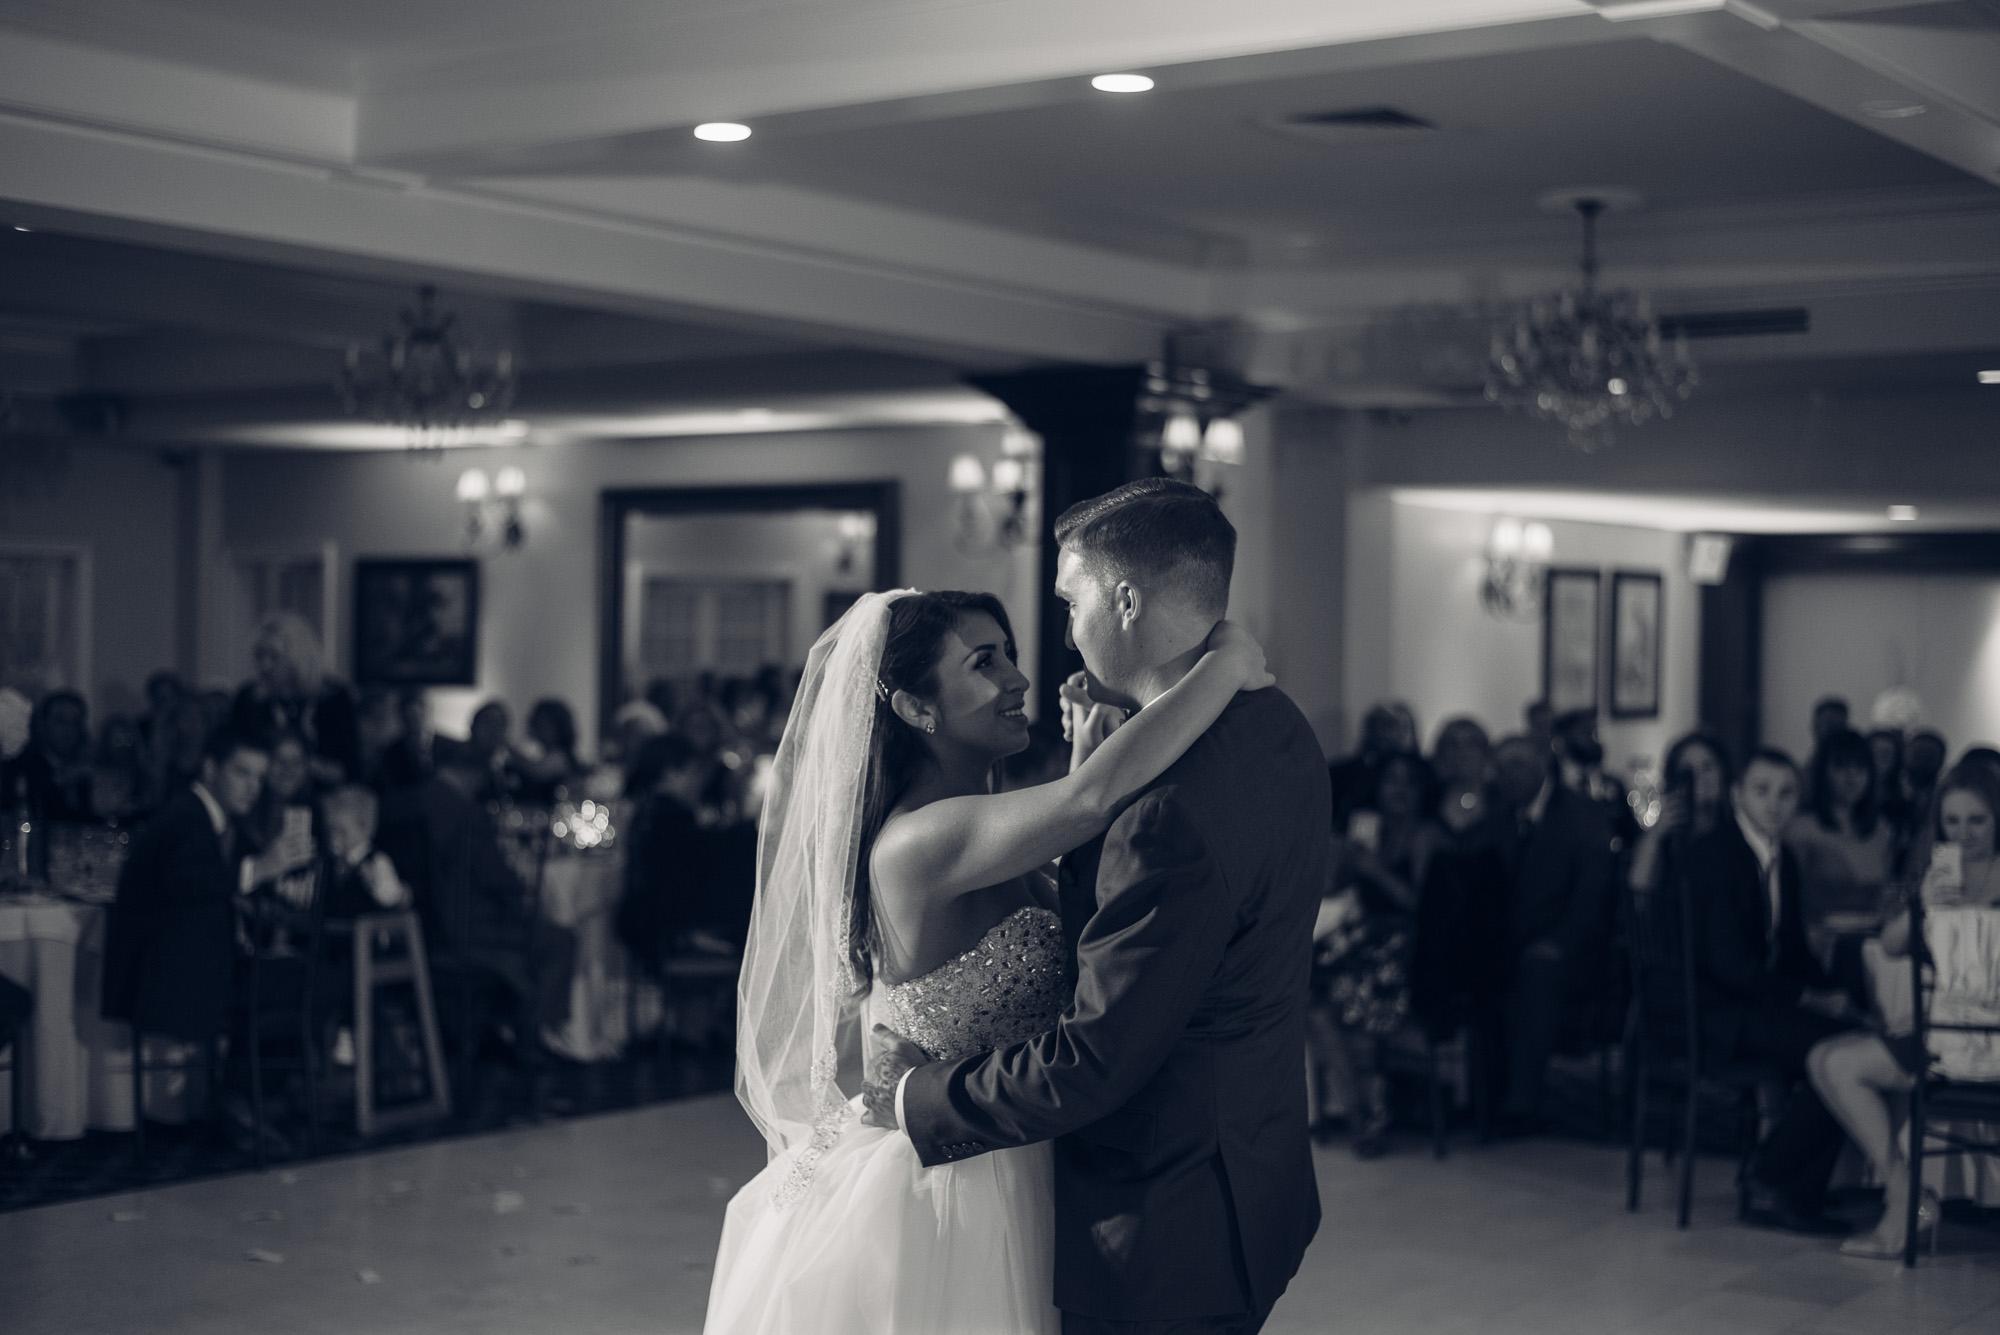 woodwinds_wedding_171020_web-46.jpg